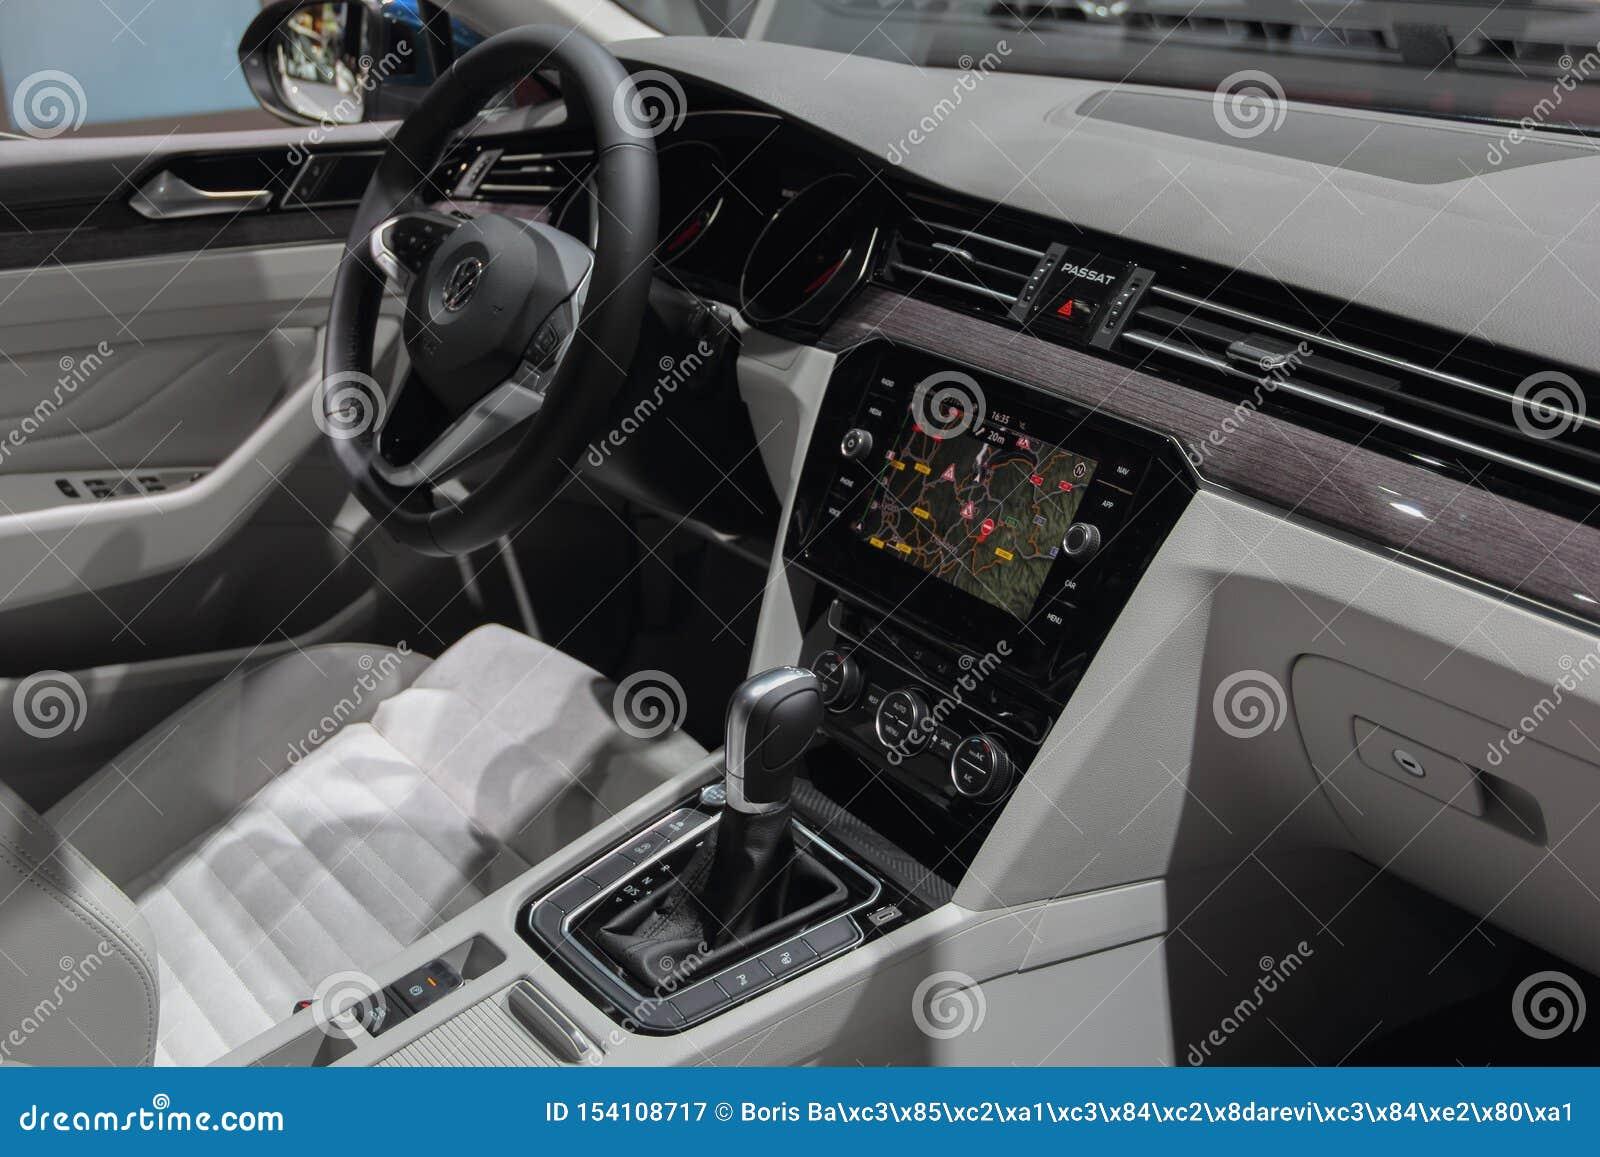 Suiza Ginebra 10 De Marzo De 2019 Interior Variable Del Gte De Volkswagen Passat El 89 O Salon Del Automovil Internacional En Fotografia Editorial Imagen De Marzo Passat 154108717